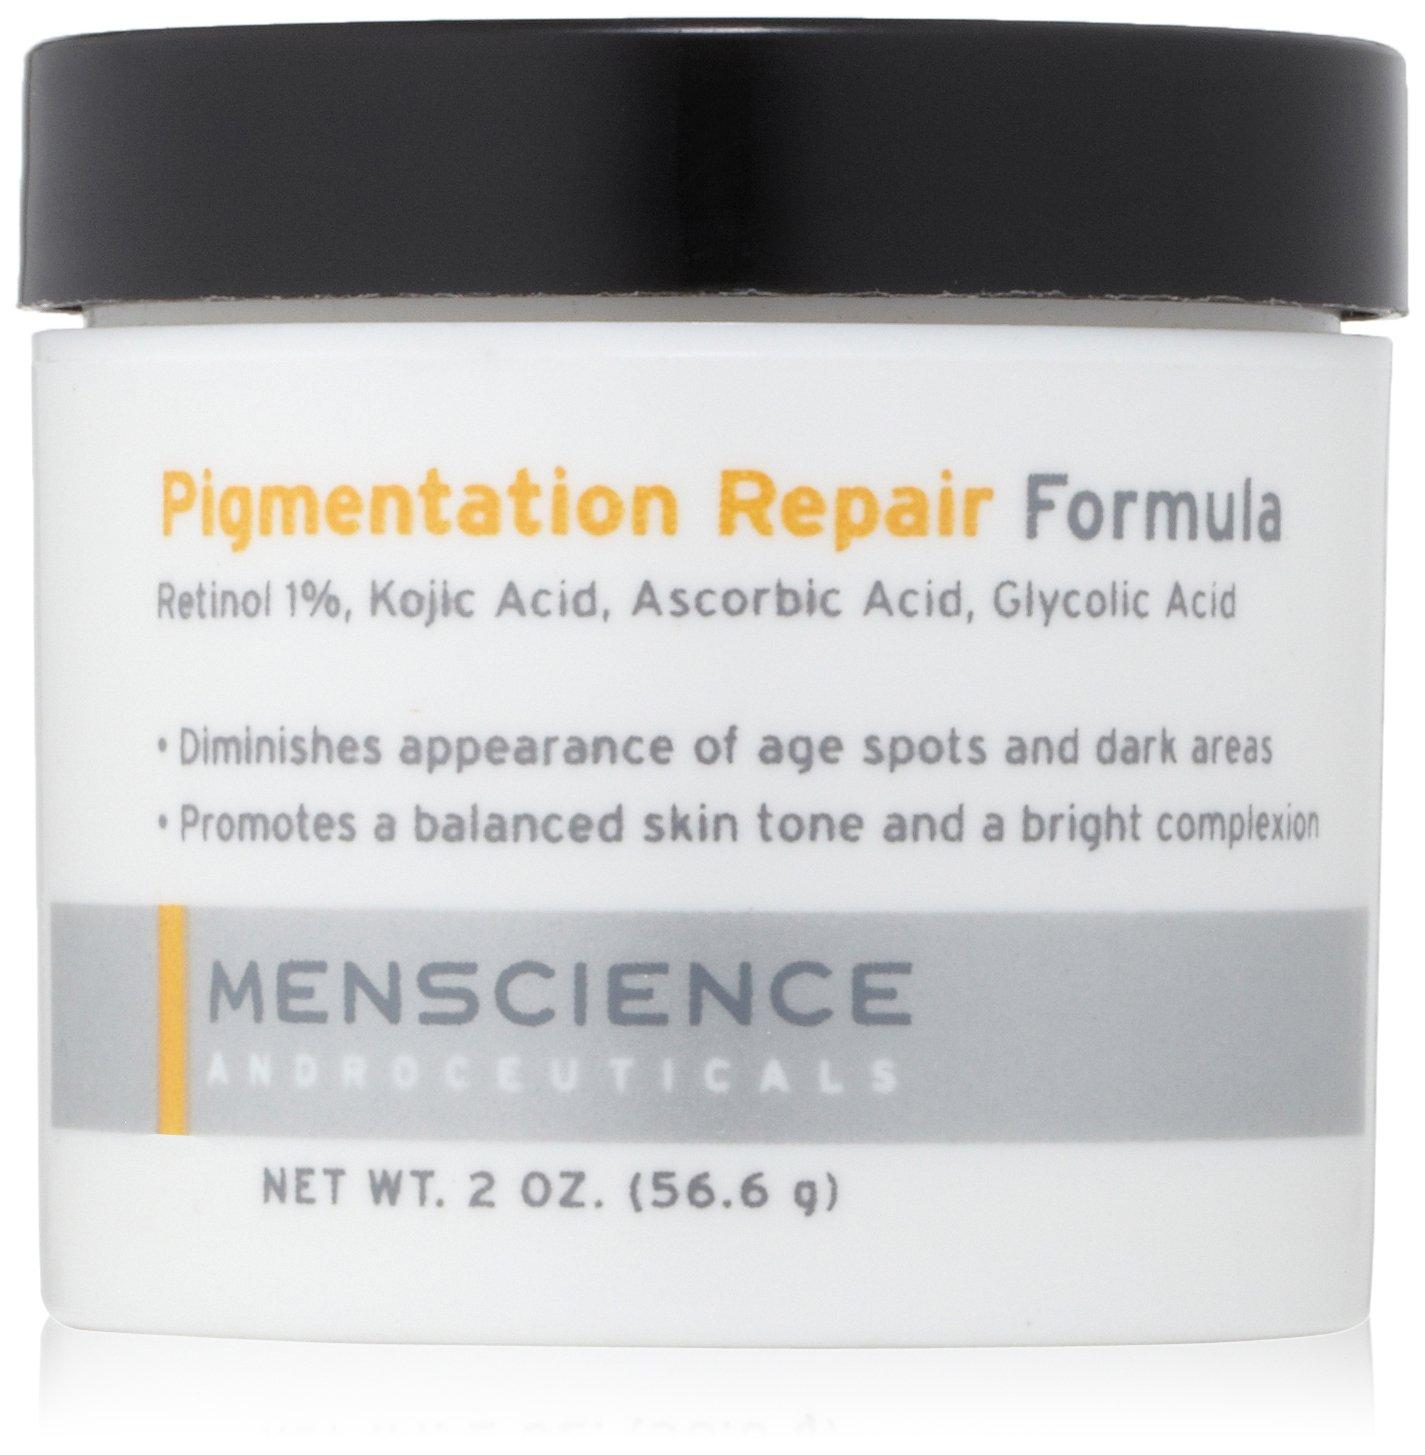 List price MenScience Mesa Mall Androceuticals Pigmentation Repair oz 2 Formula